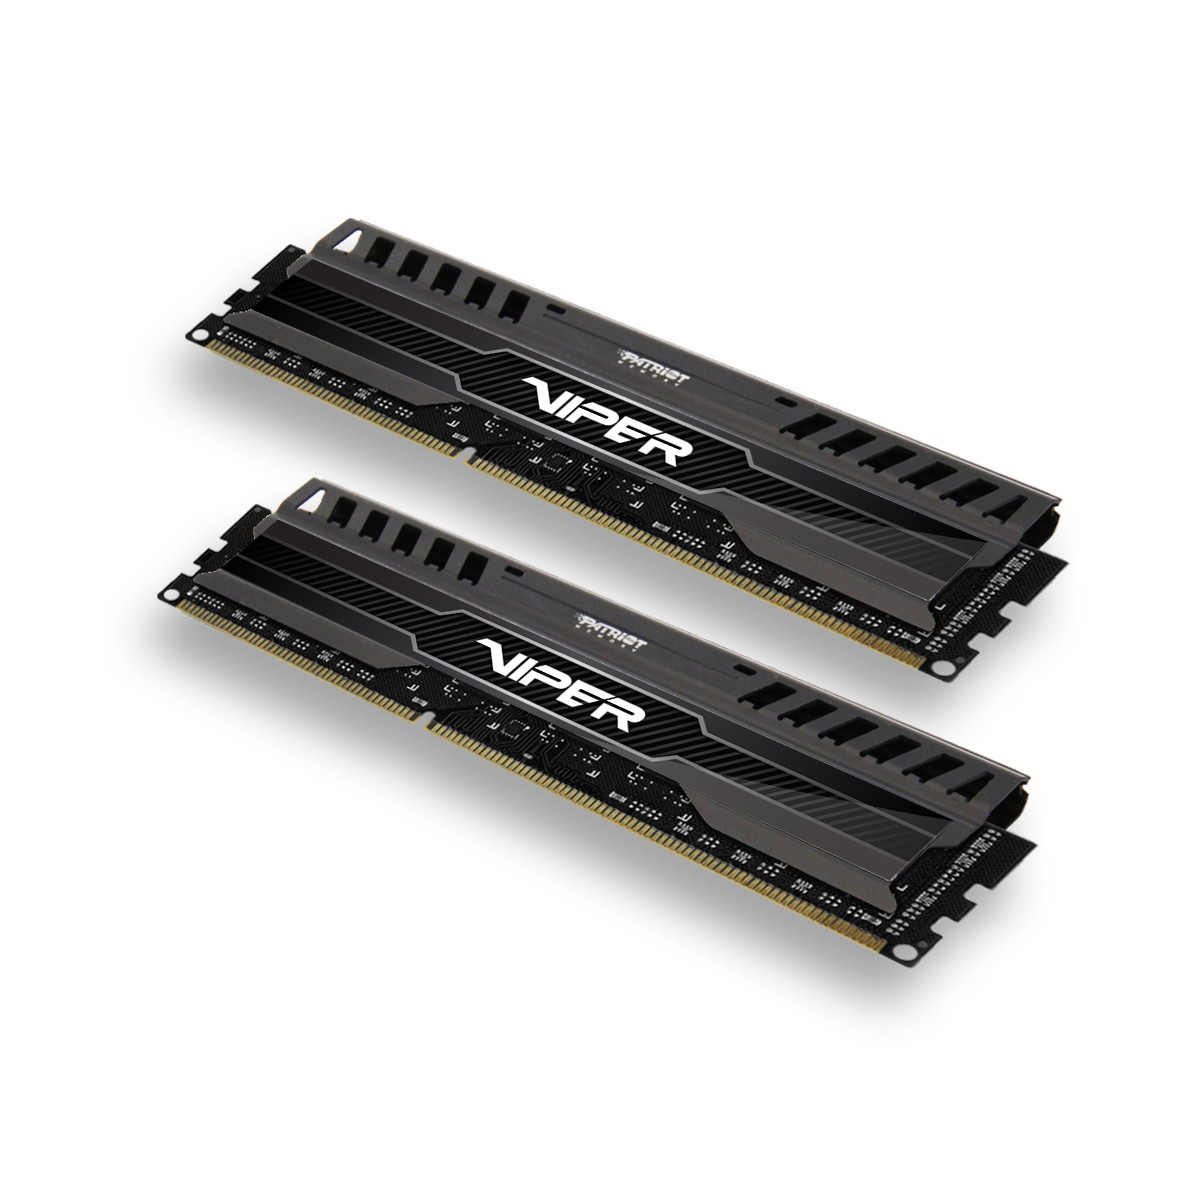 Memória Viper 3 8GB (2x4GB) DDR3 2133MHz PV38G213C1K - Patriot